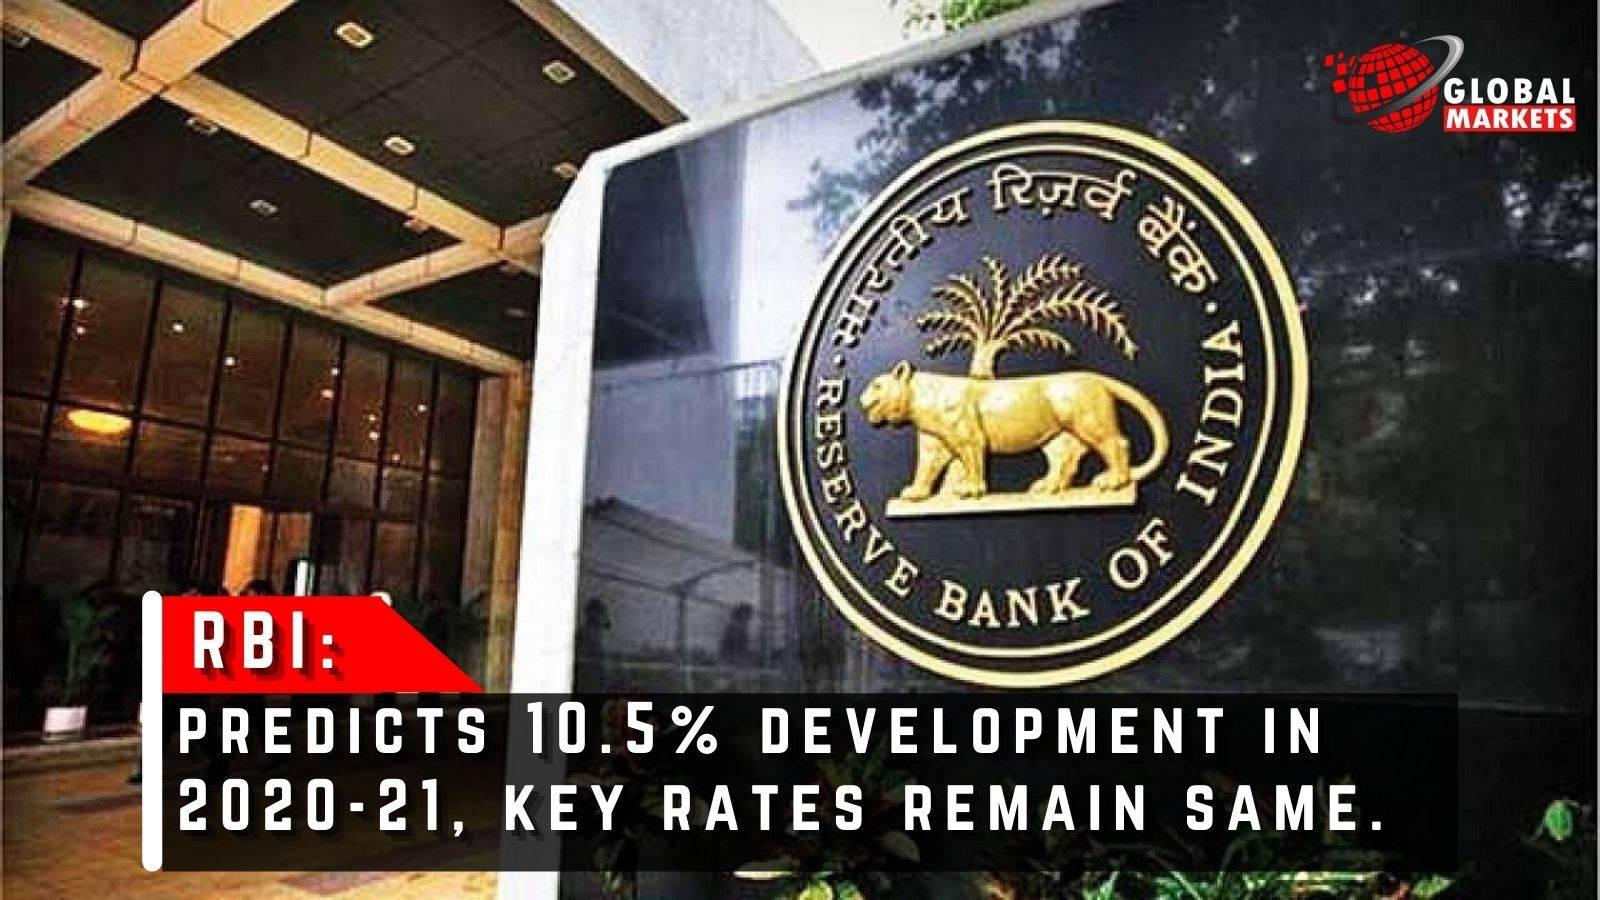 RBI Predicts 10.5% Development In 2020-21, Key Rates Remain Same